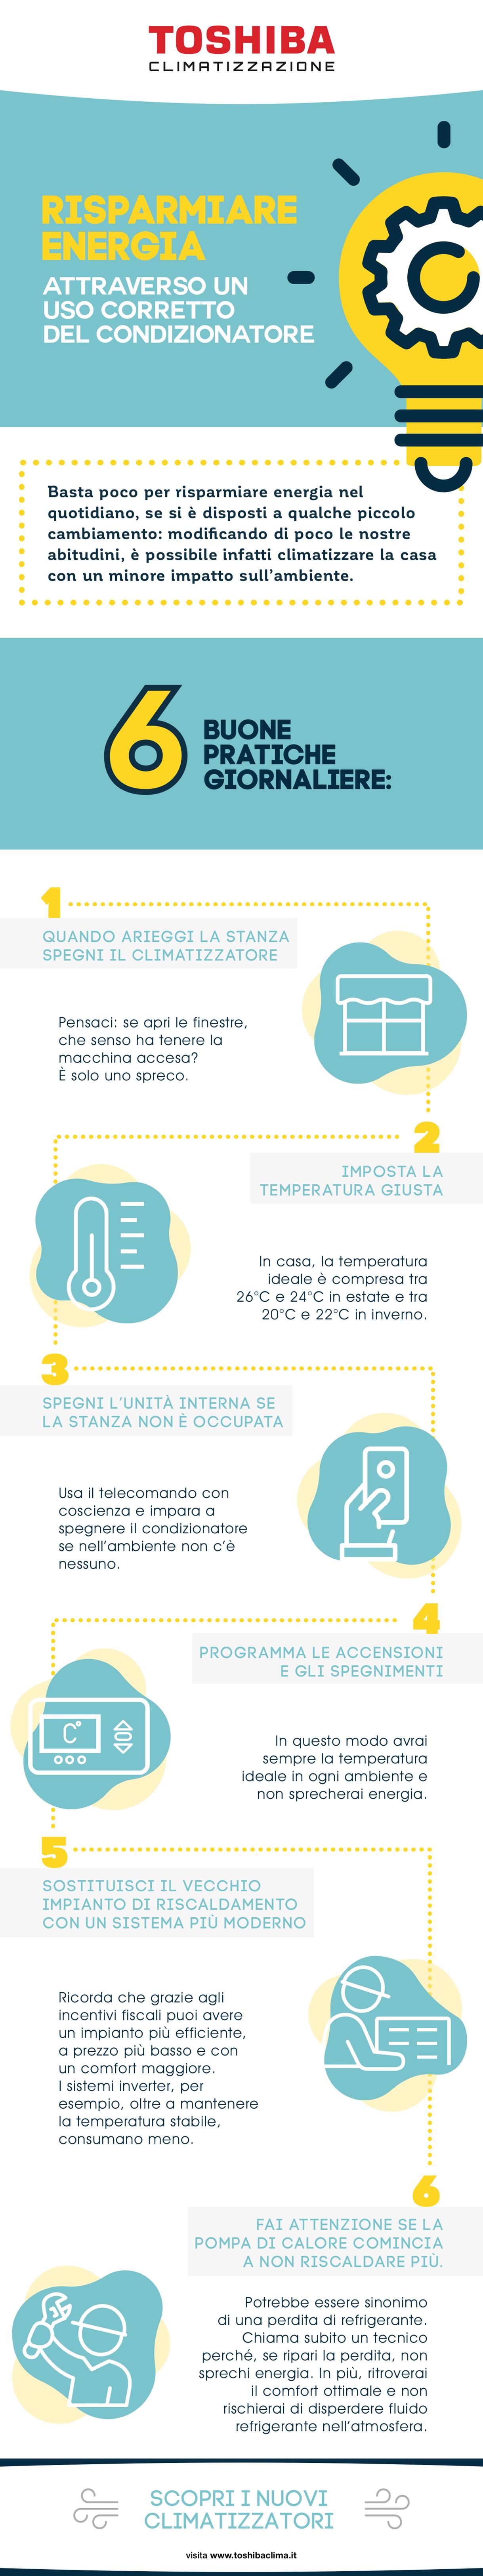 Infografica - Risparmio energia.png